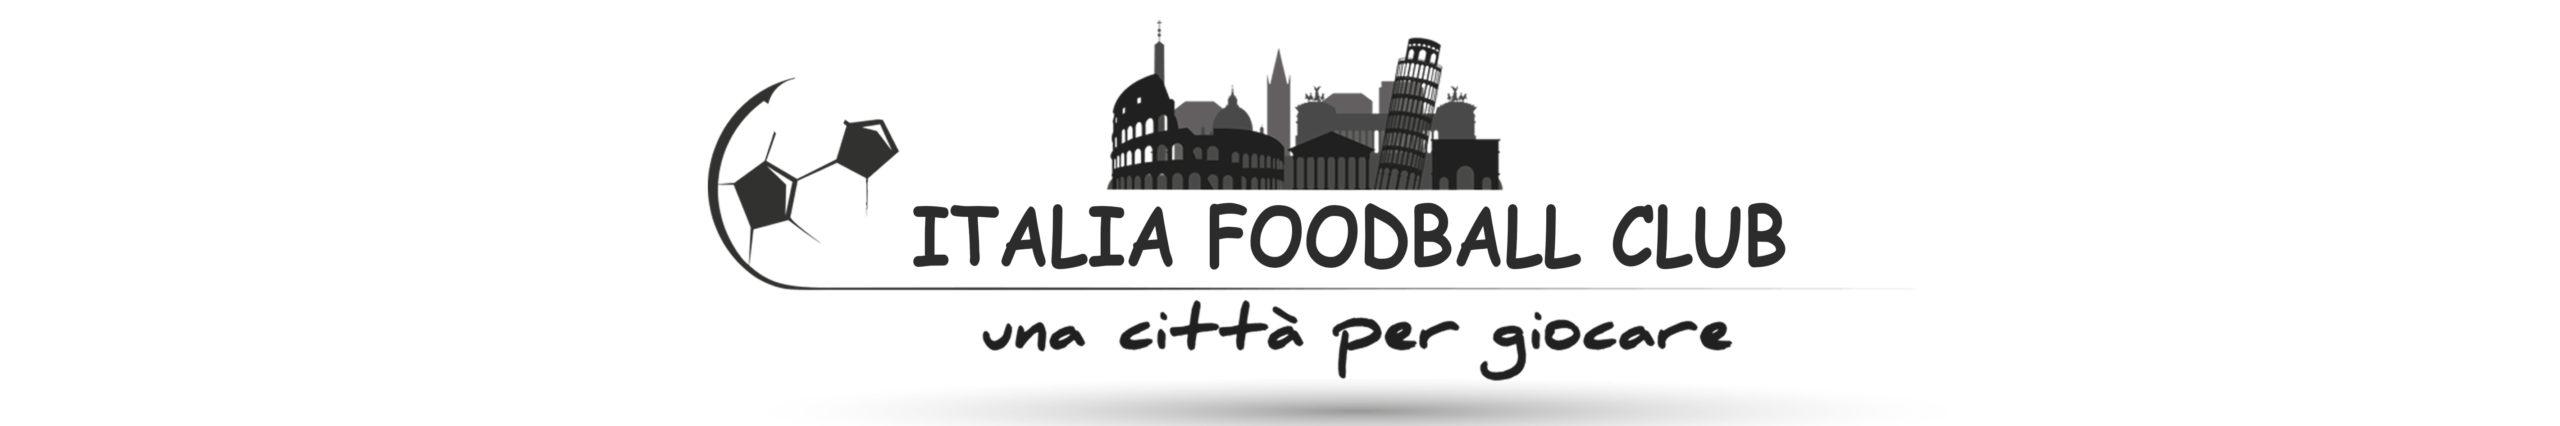 Italia Foodball Club